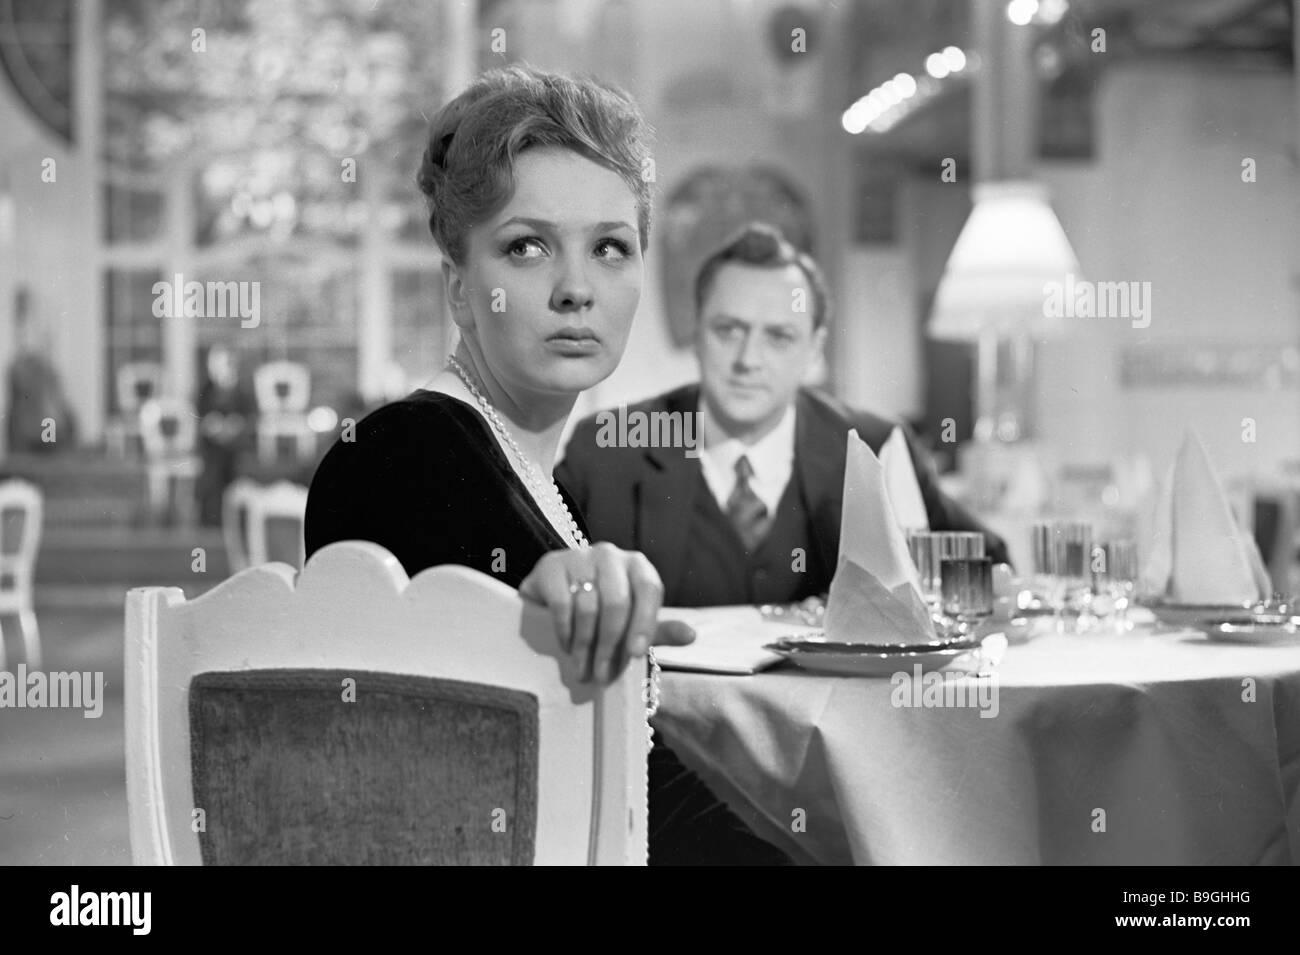 Natalya Tenyakov a as Tonya left and Vladislav Strzhelchik right in Ilya Gurin s film Our Acquaintances adapted - Stock Image